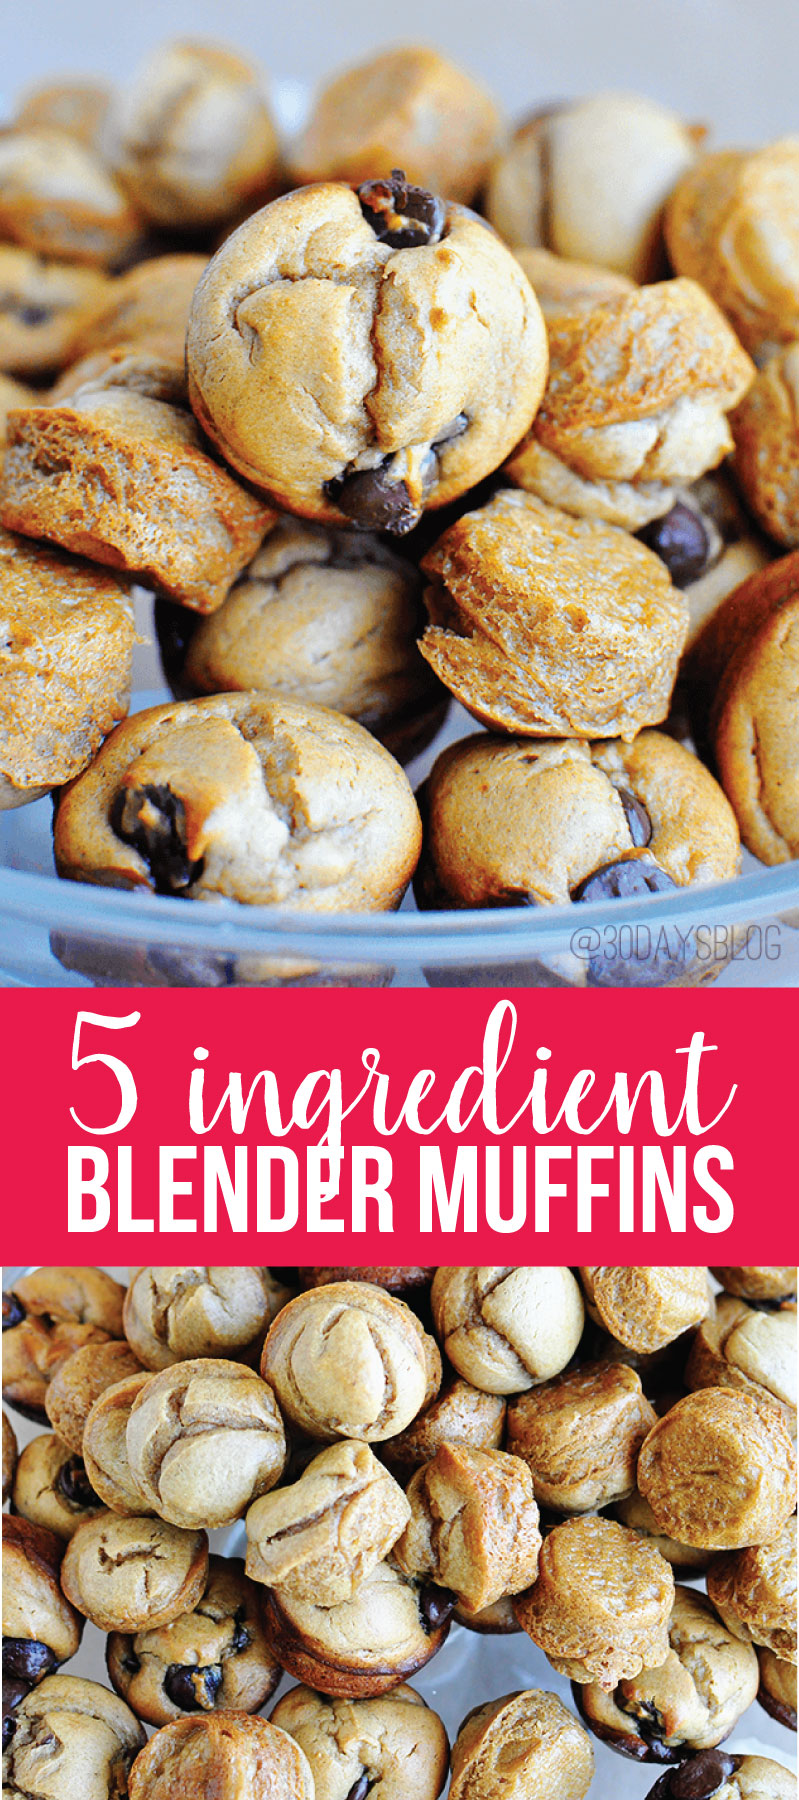 Peanut Butter Banana 5 ingredient blender muffins - these taste amazing, are easy to make and gluten free!  www.thirtyhandmadedays.com